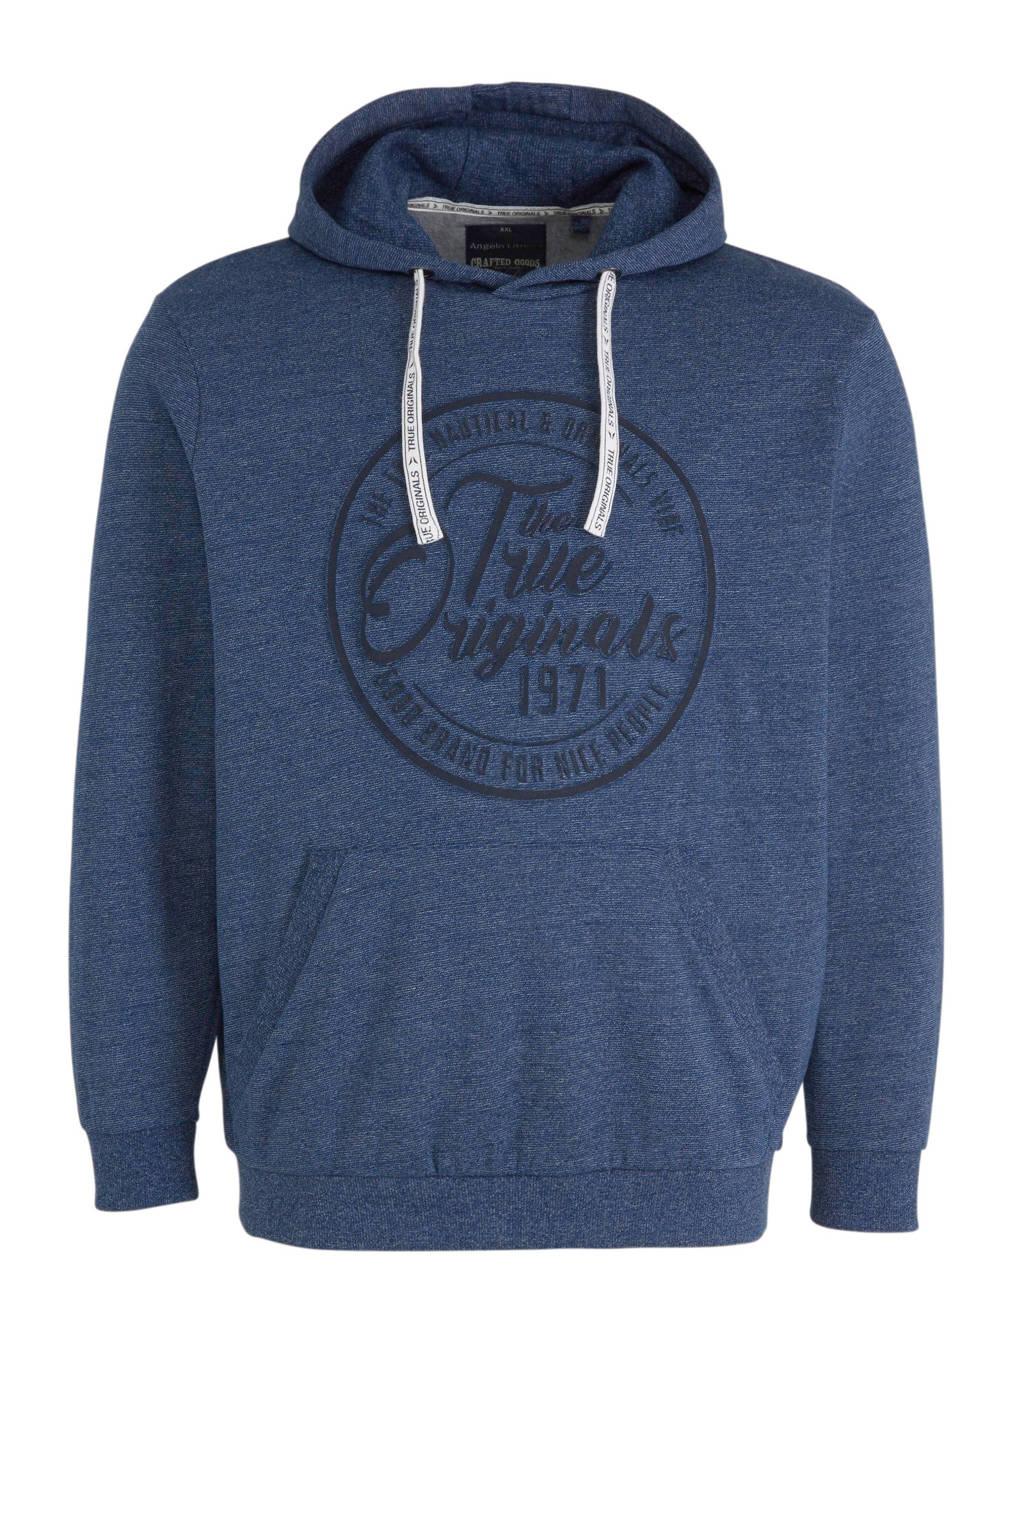 C&A XL Angelo Litrico hoodie met printopdruk donkerblauw, Donkerblauw